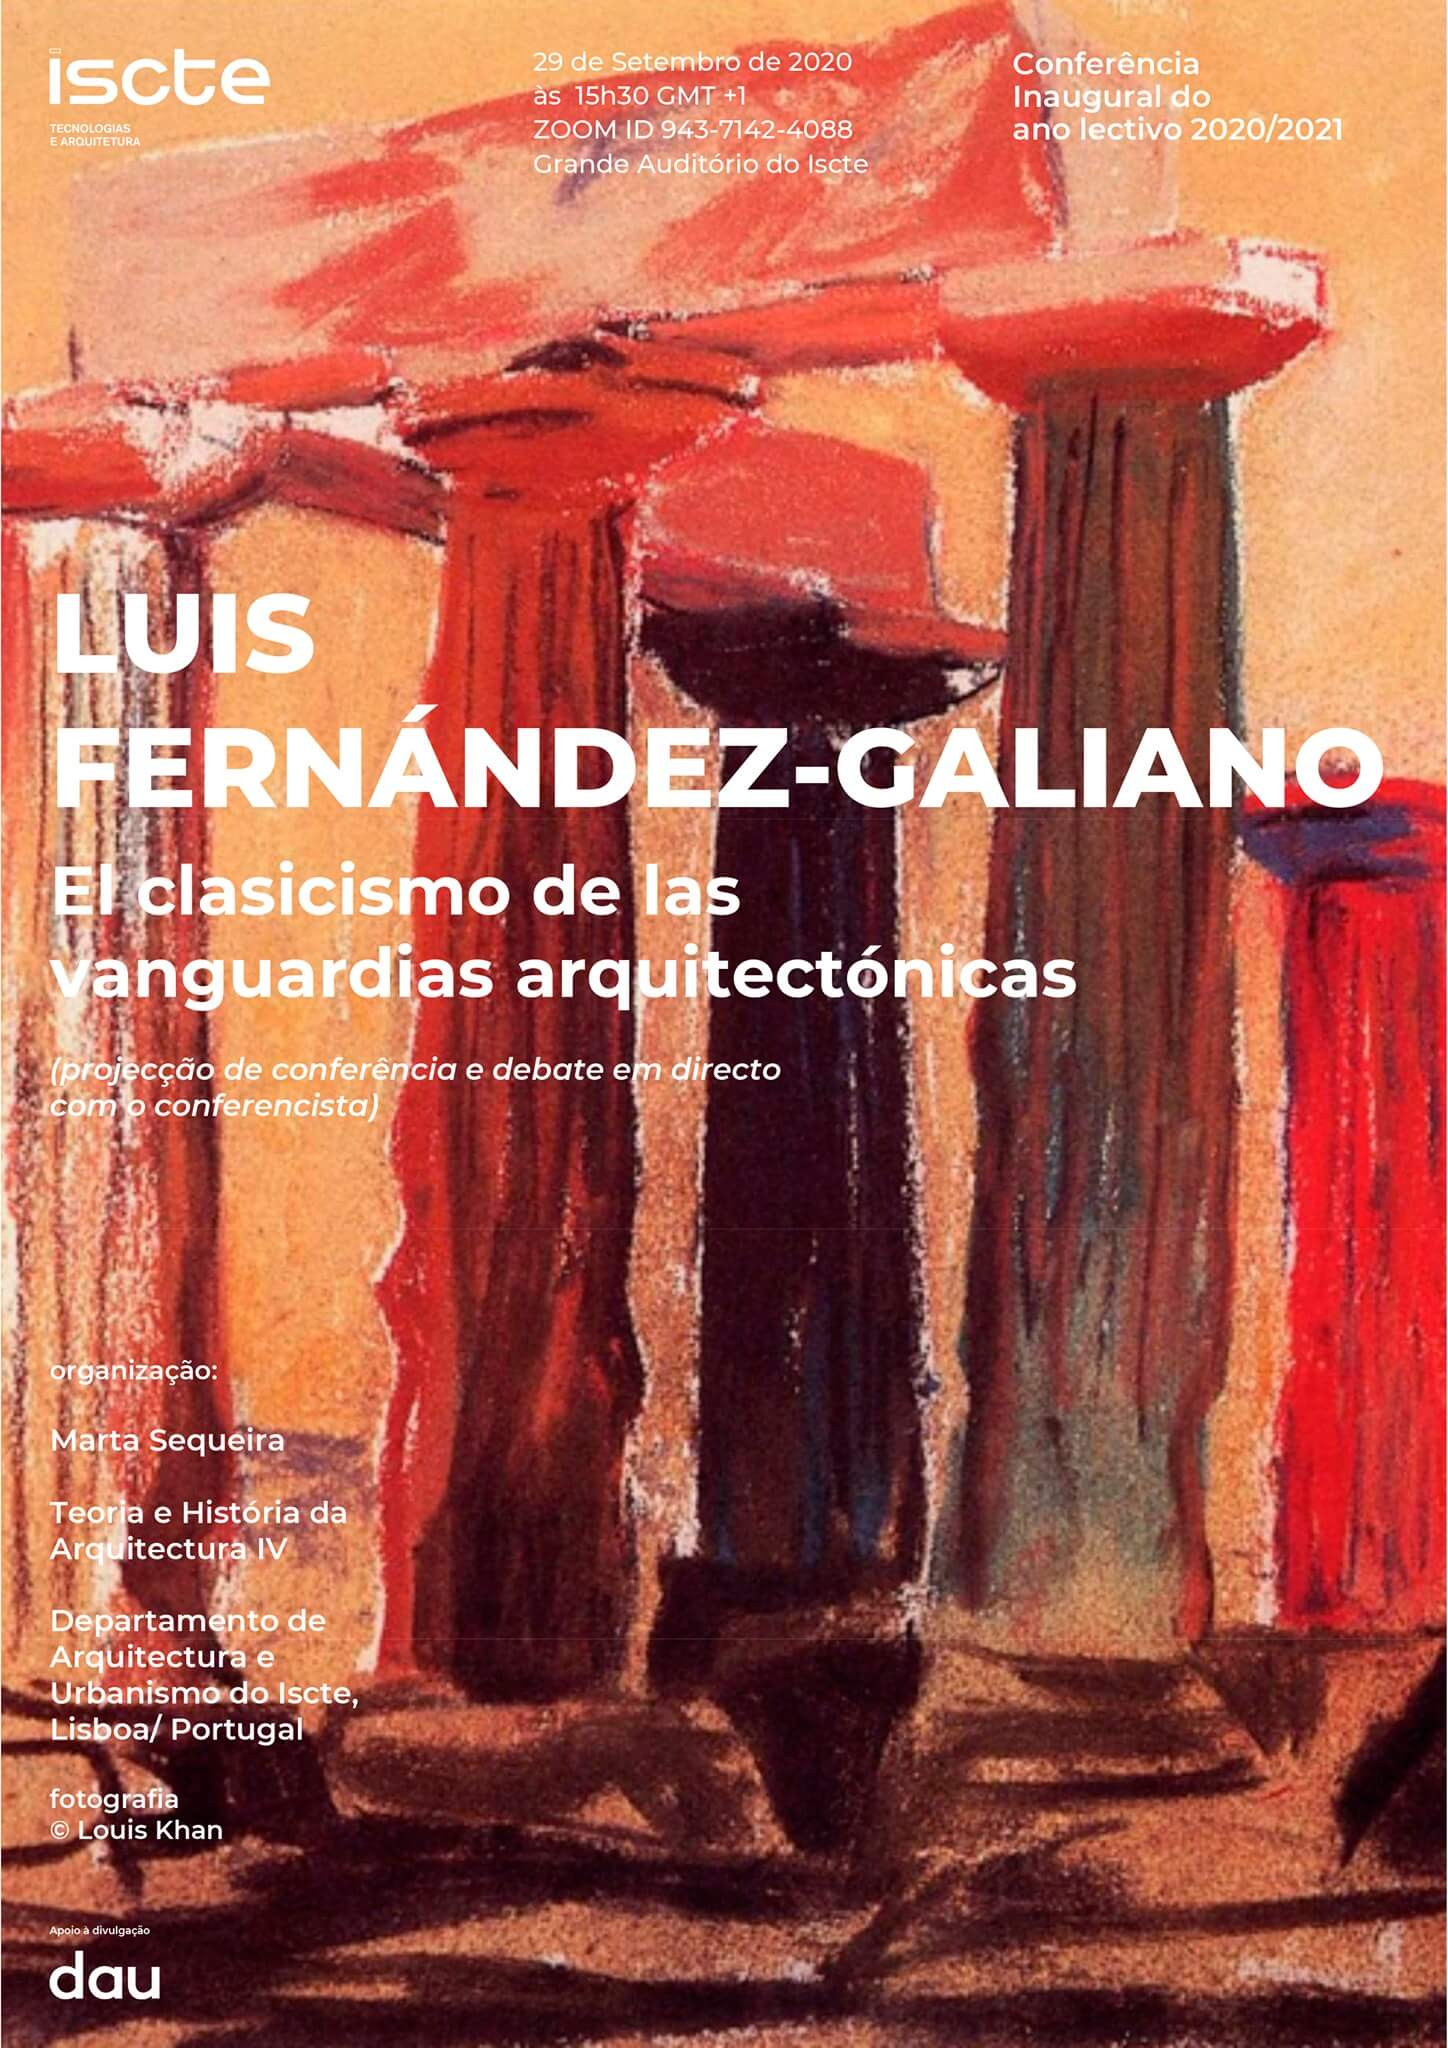 Conferência com Luis Fernández-Galiano